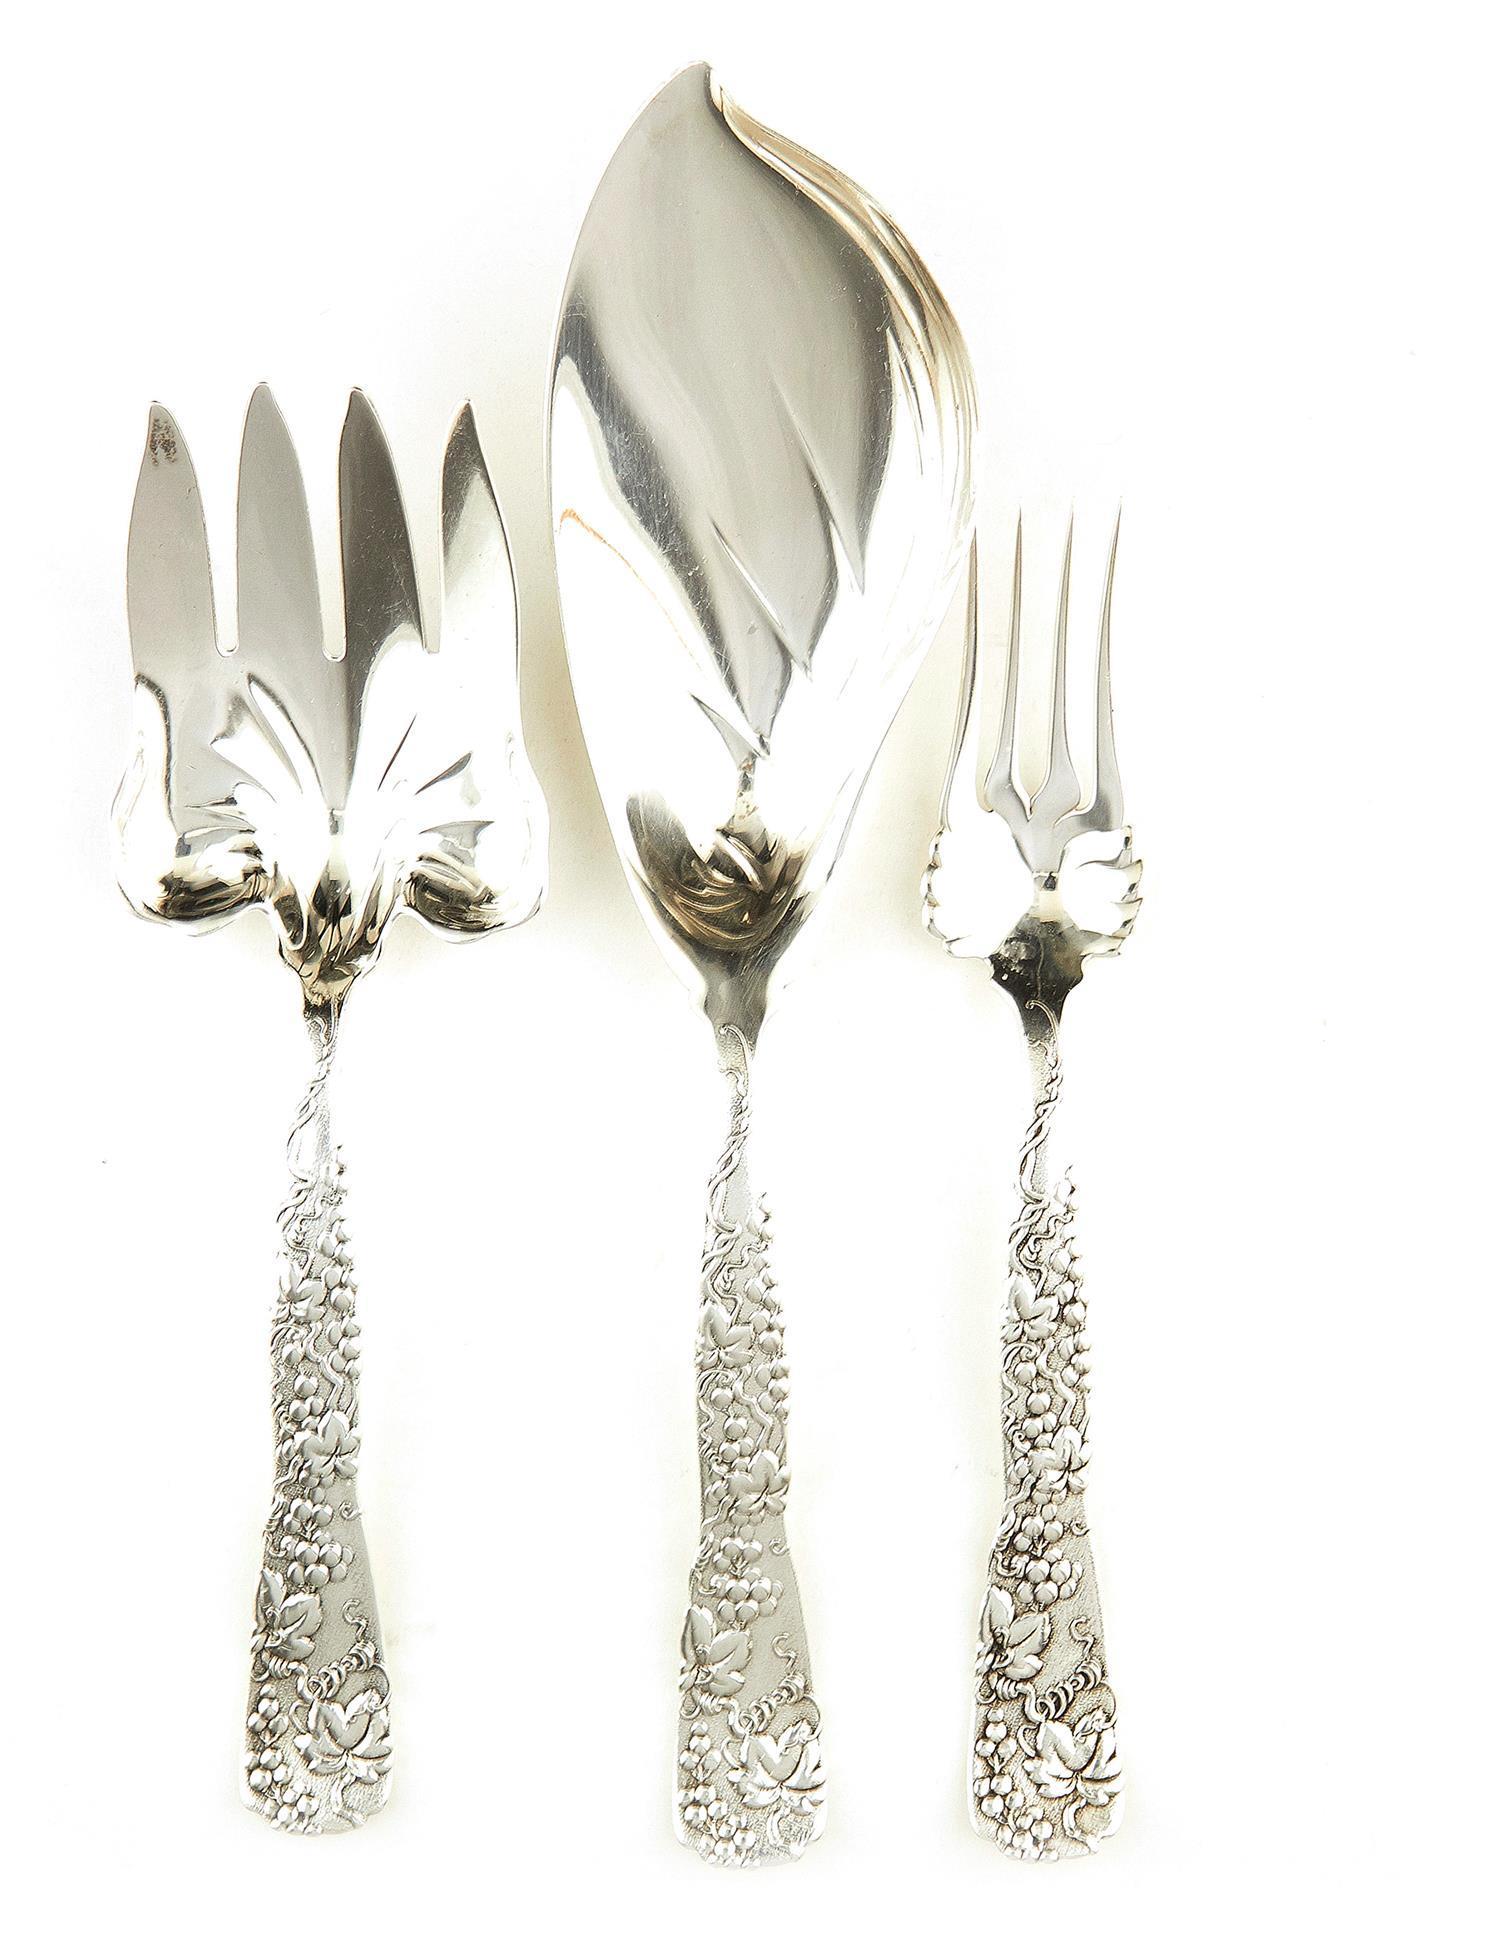 American silver flatware, Tiffany & Co (6pcs)